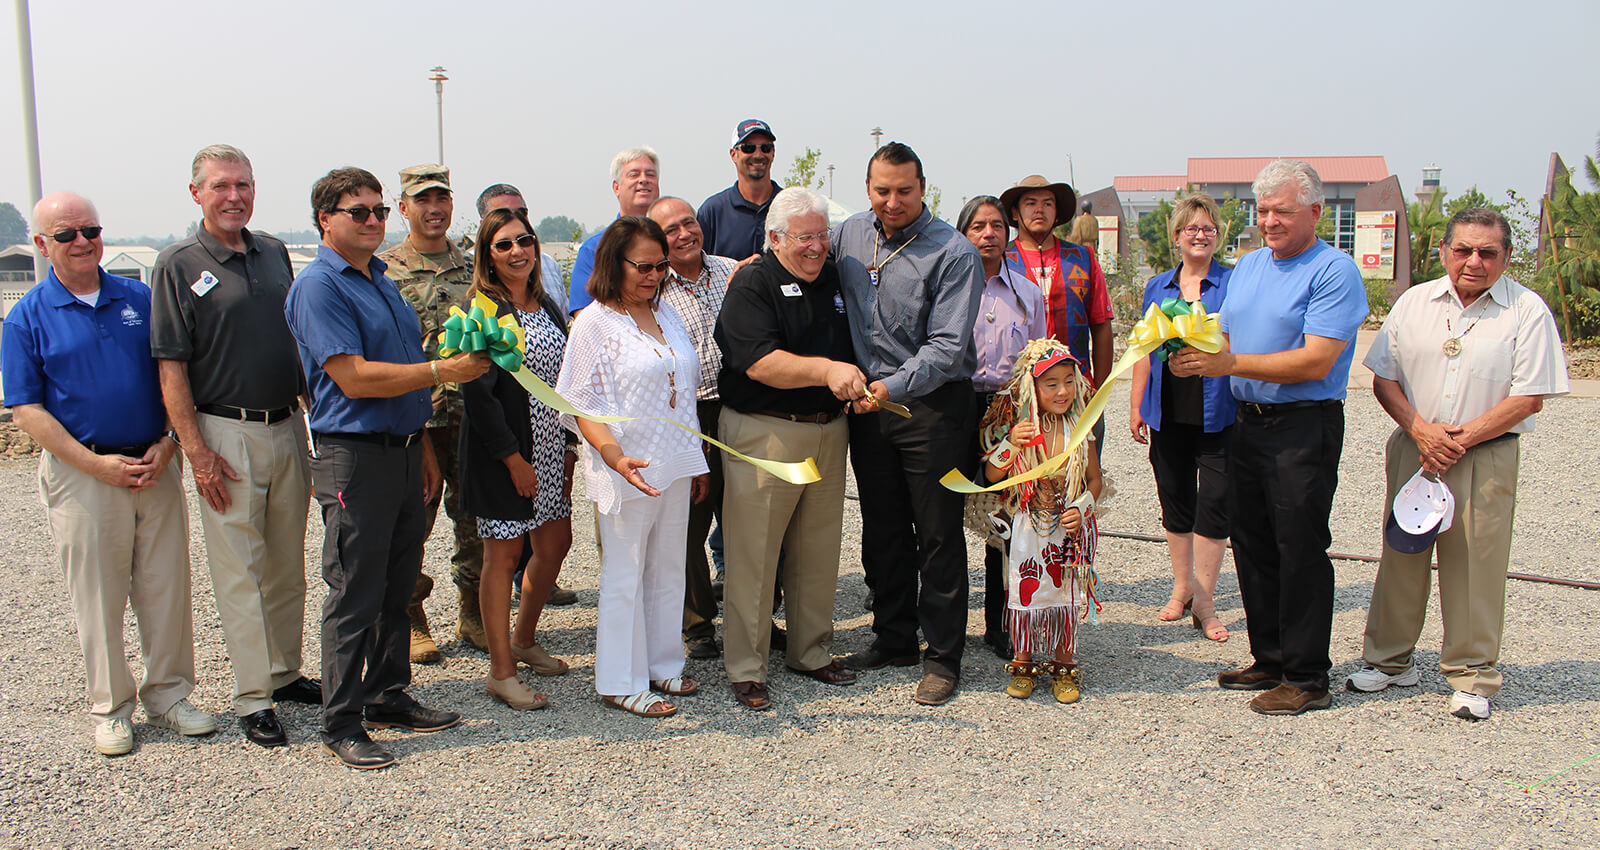 Port and Tribal officials cut ceremonial ribbon celebrating artwork.